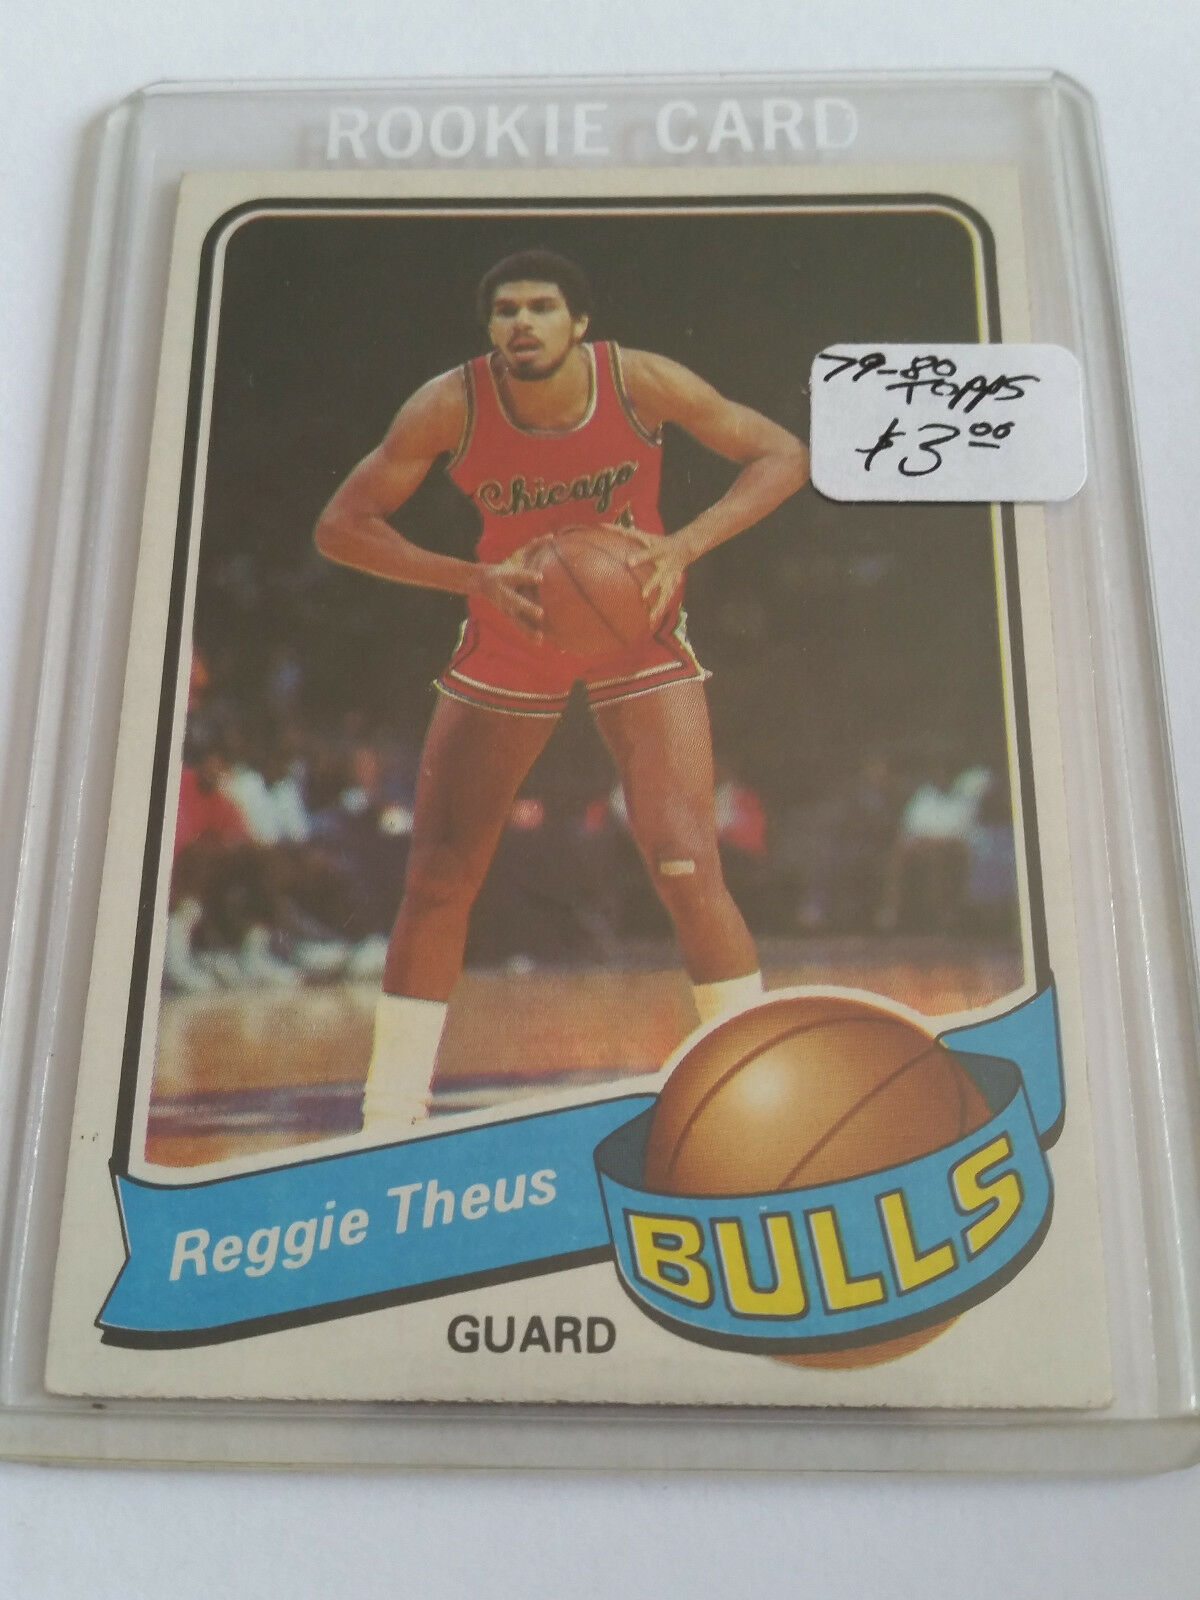 1979 Topps Reggie Theus 44 Basketball Card